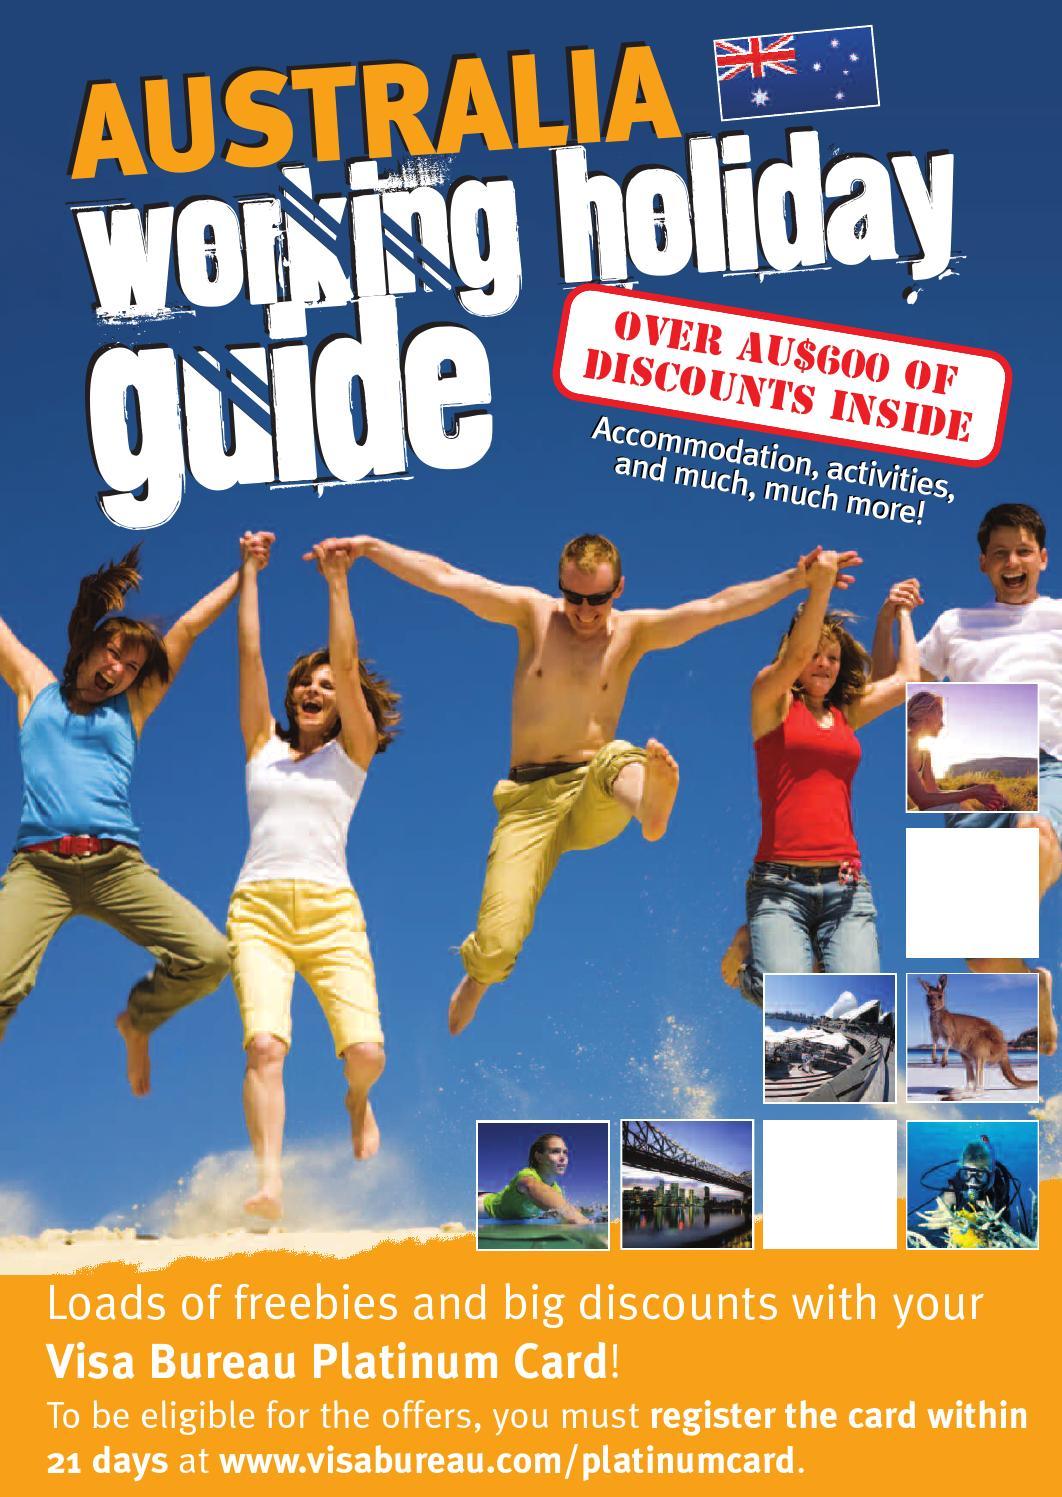 visa bureau australia working holiday guide by domvb issuu. Black Bedroom Furniture Sets. Home Design Ideas